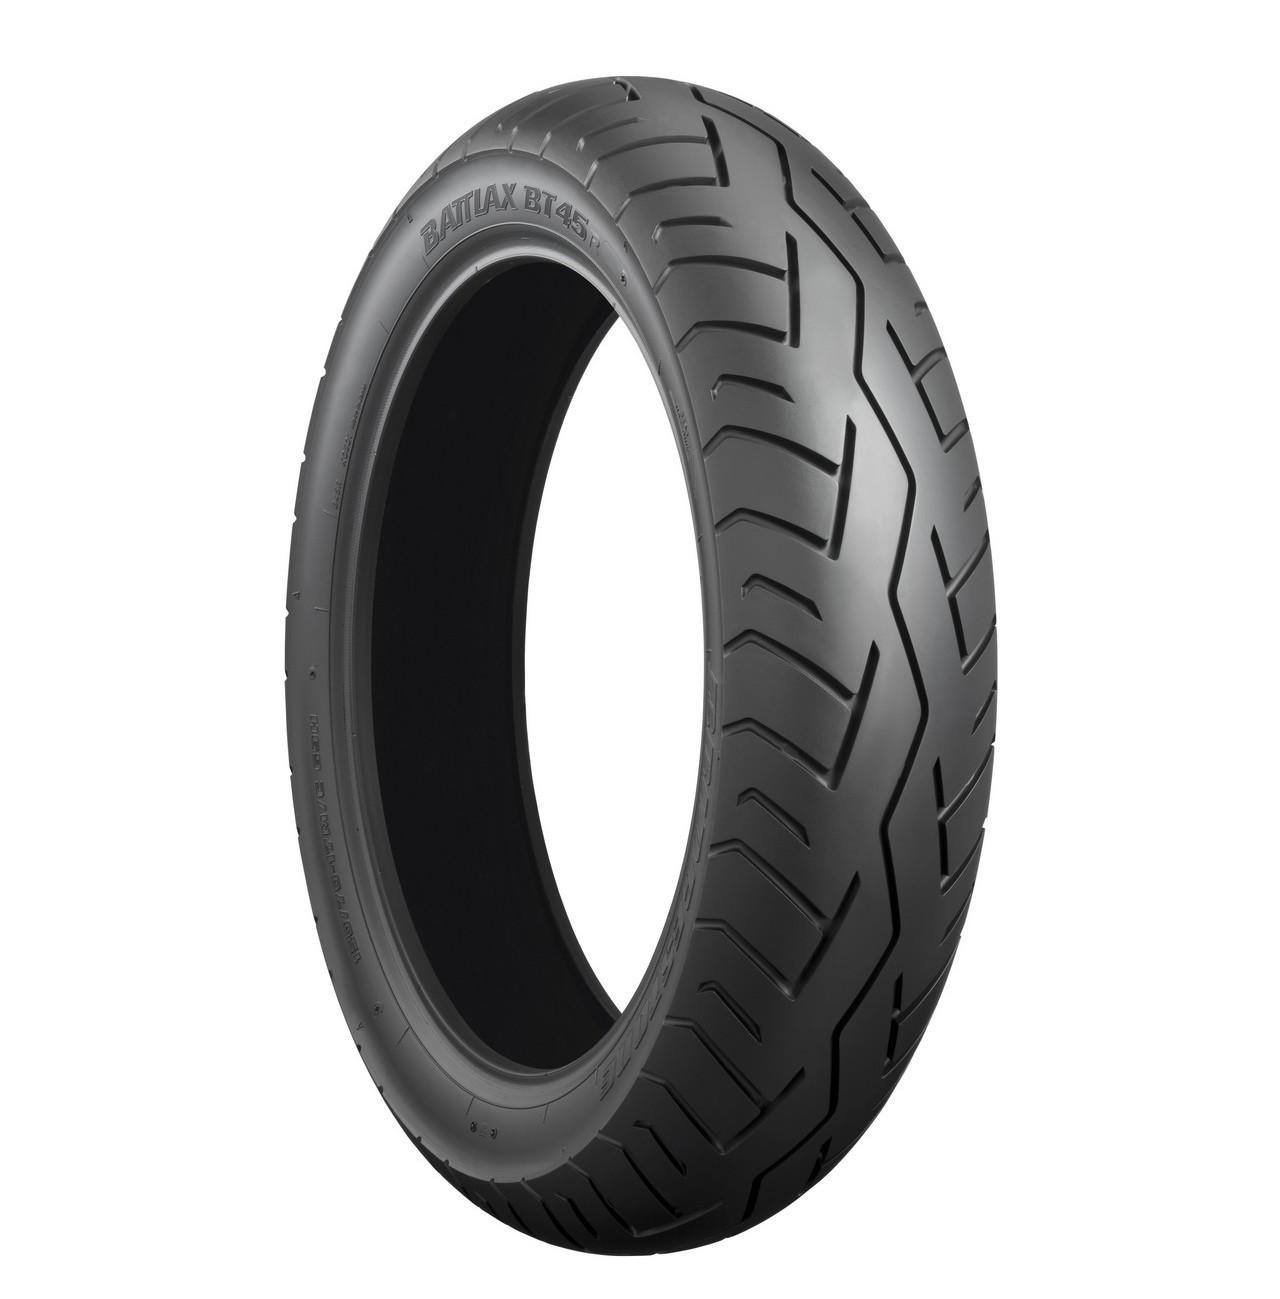 Bridgestone BT45 Battlax Rear Tyre 130//70-17 62H Motorcycle Tyre BT45R Bias H